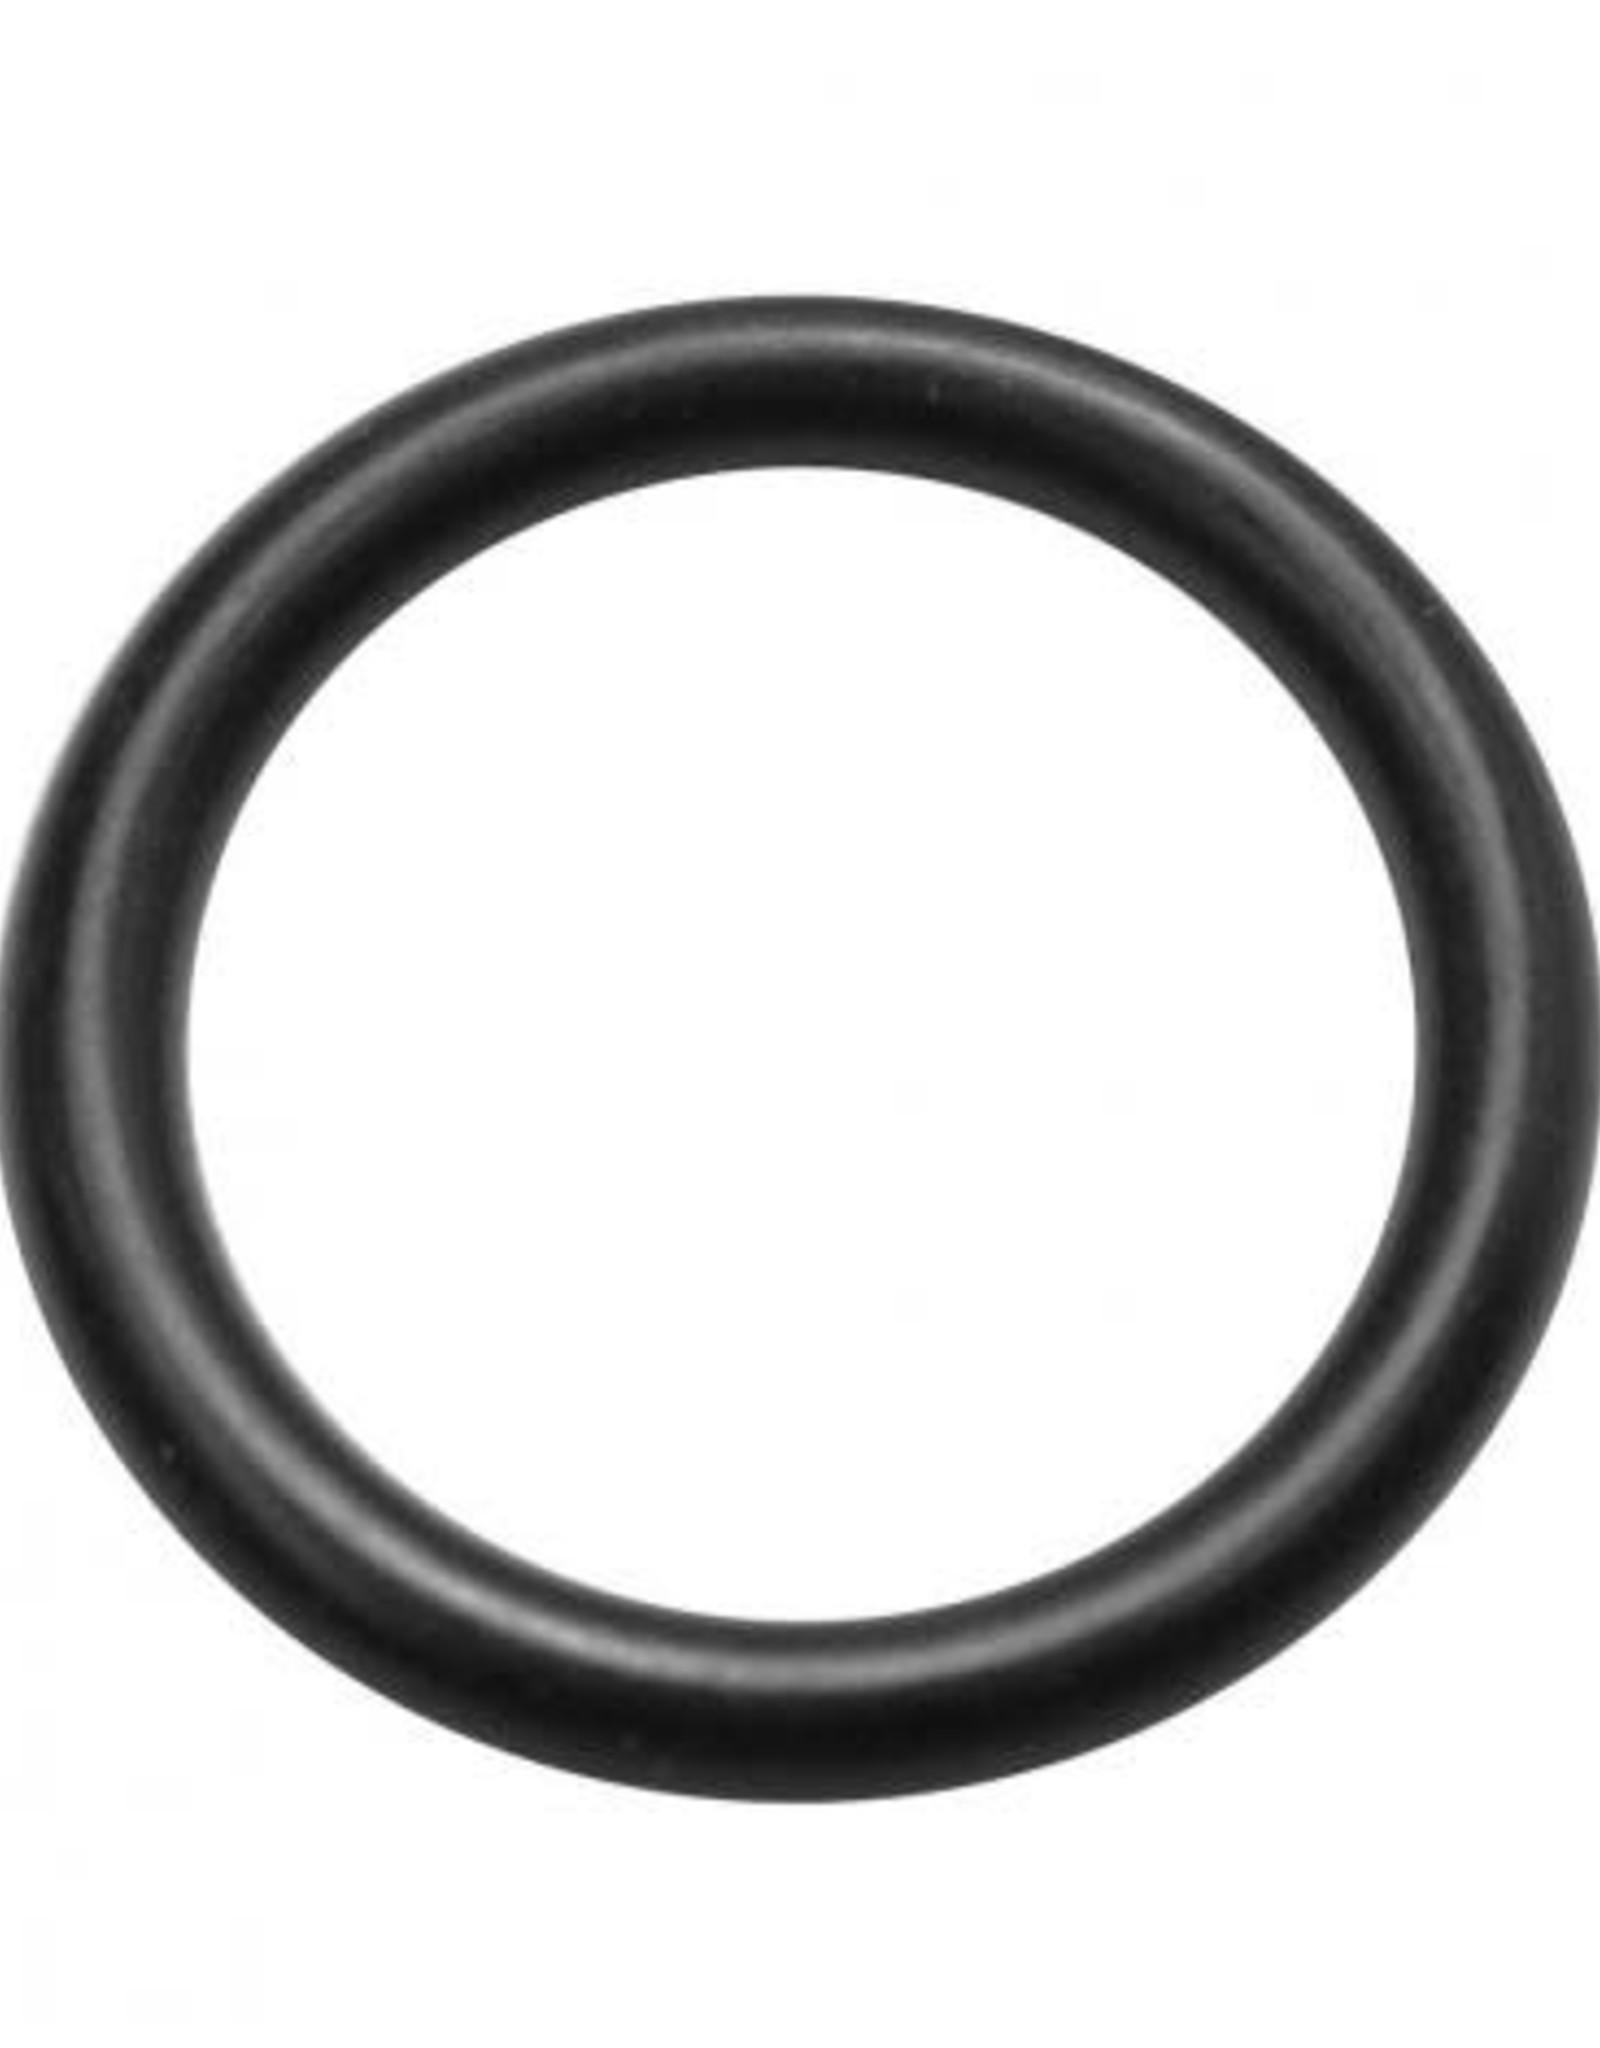 Body O-Ring- (taprite, ABECO, KeyKeg couplers)